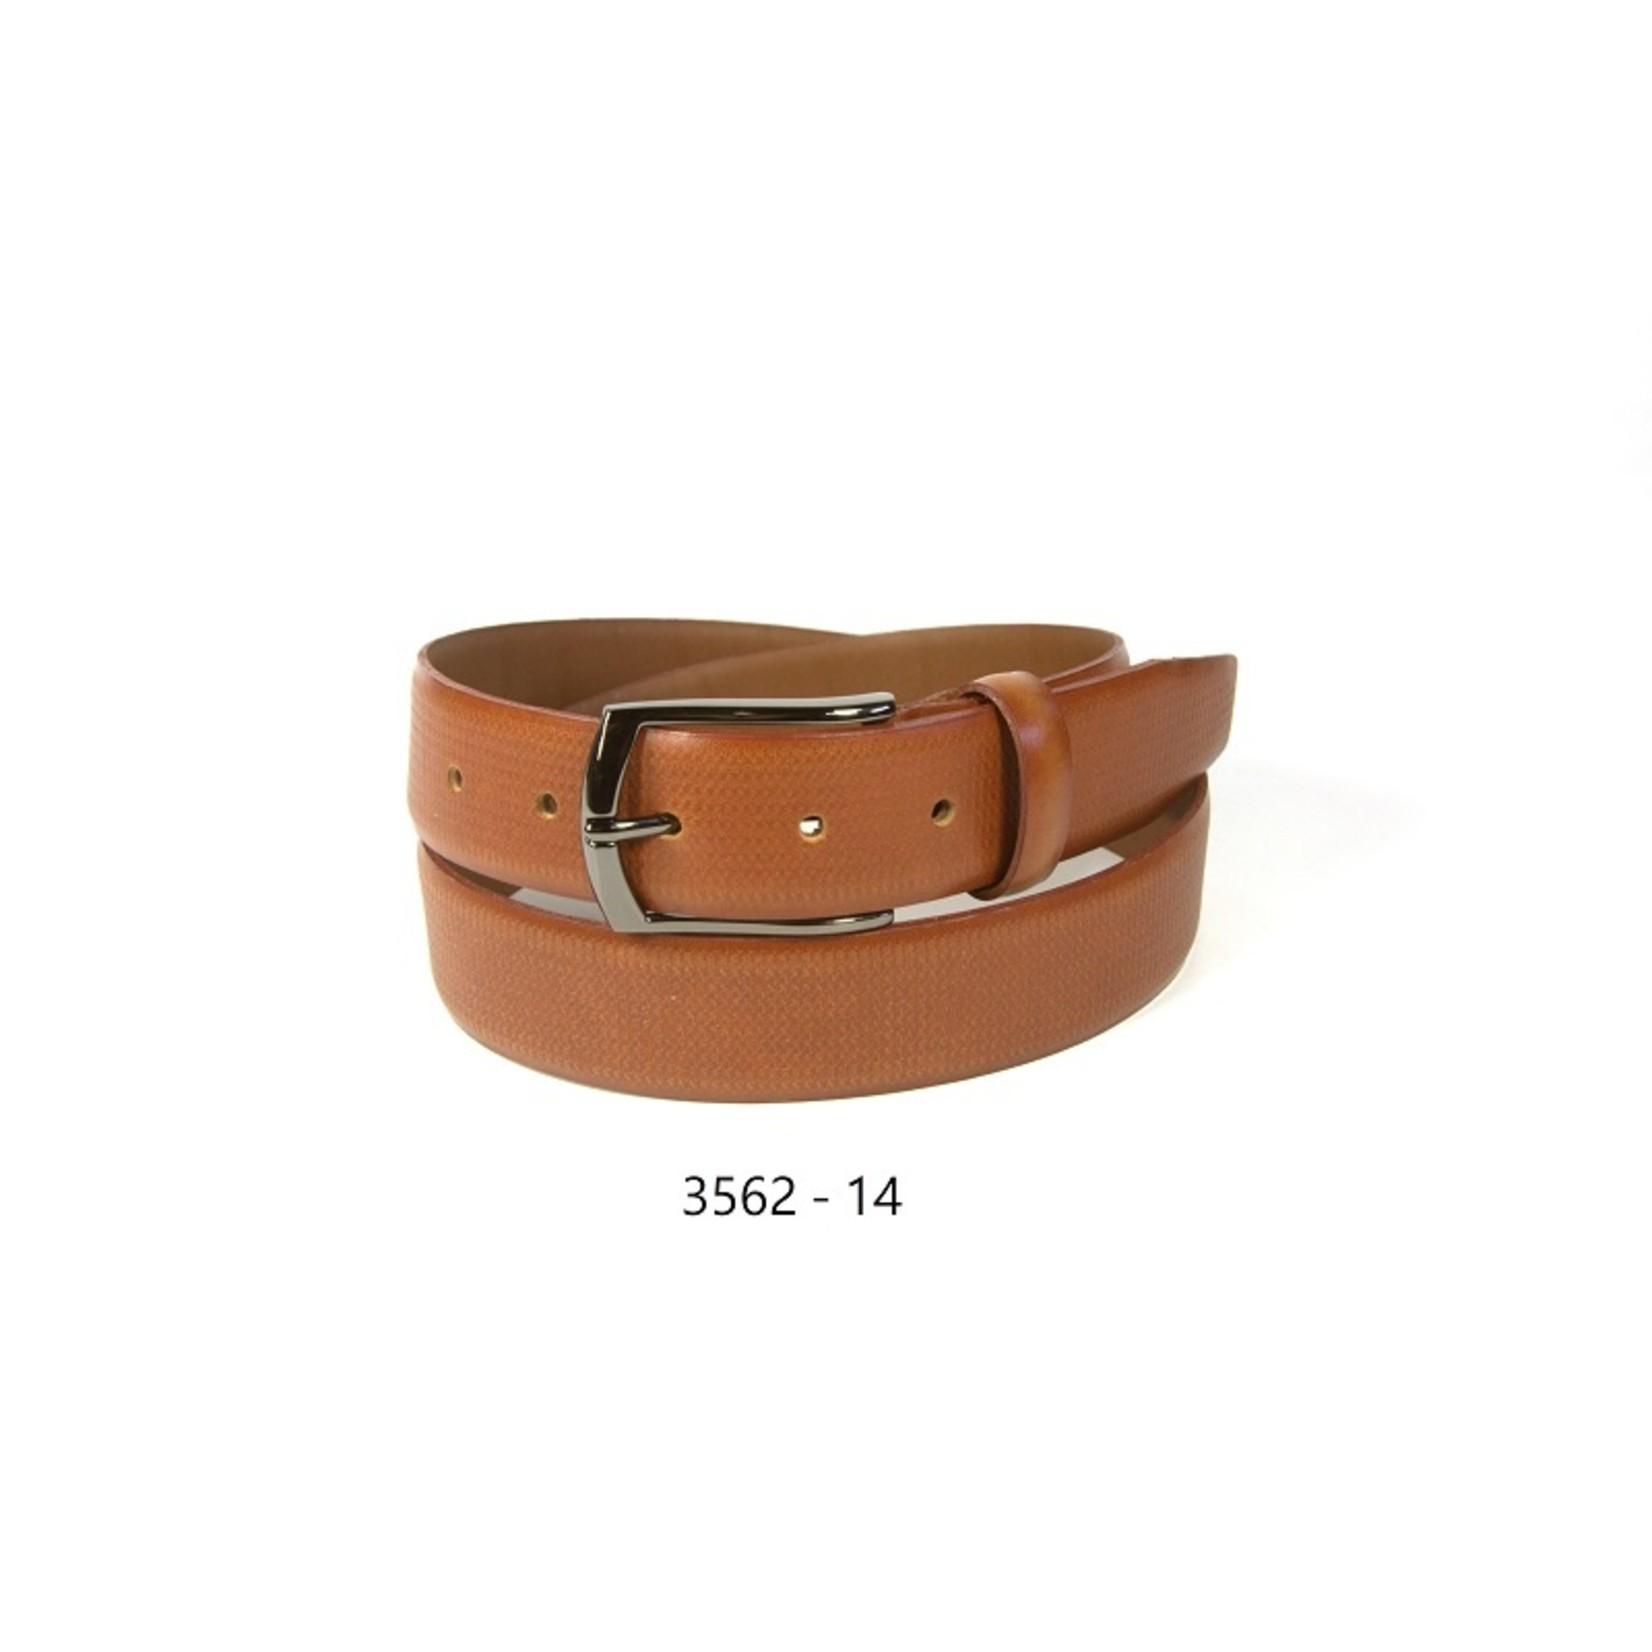 Benchcraft Bench Craft 3562 Emboss Houndstooth Belt